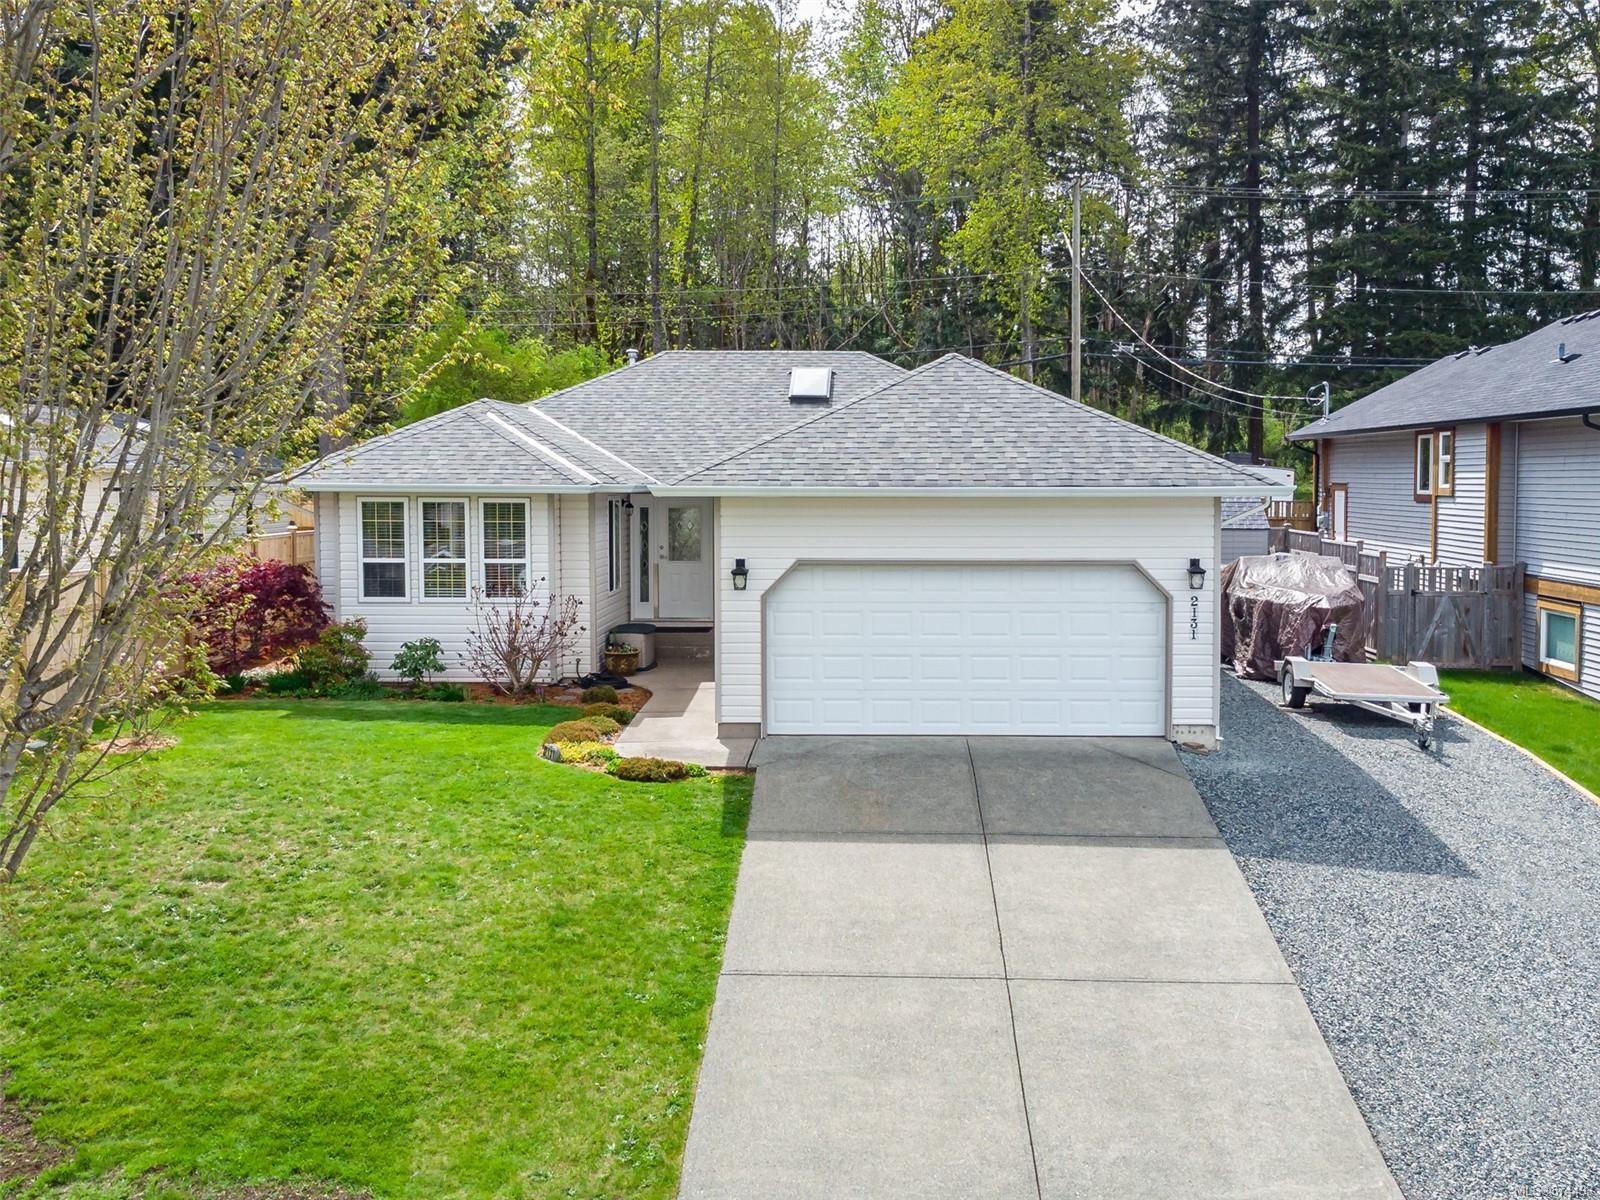 Main Photo: 2131 Morello Pl in : CV Courtenay City House for sale (Comox Valley)  : MLS®# 874493